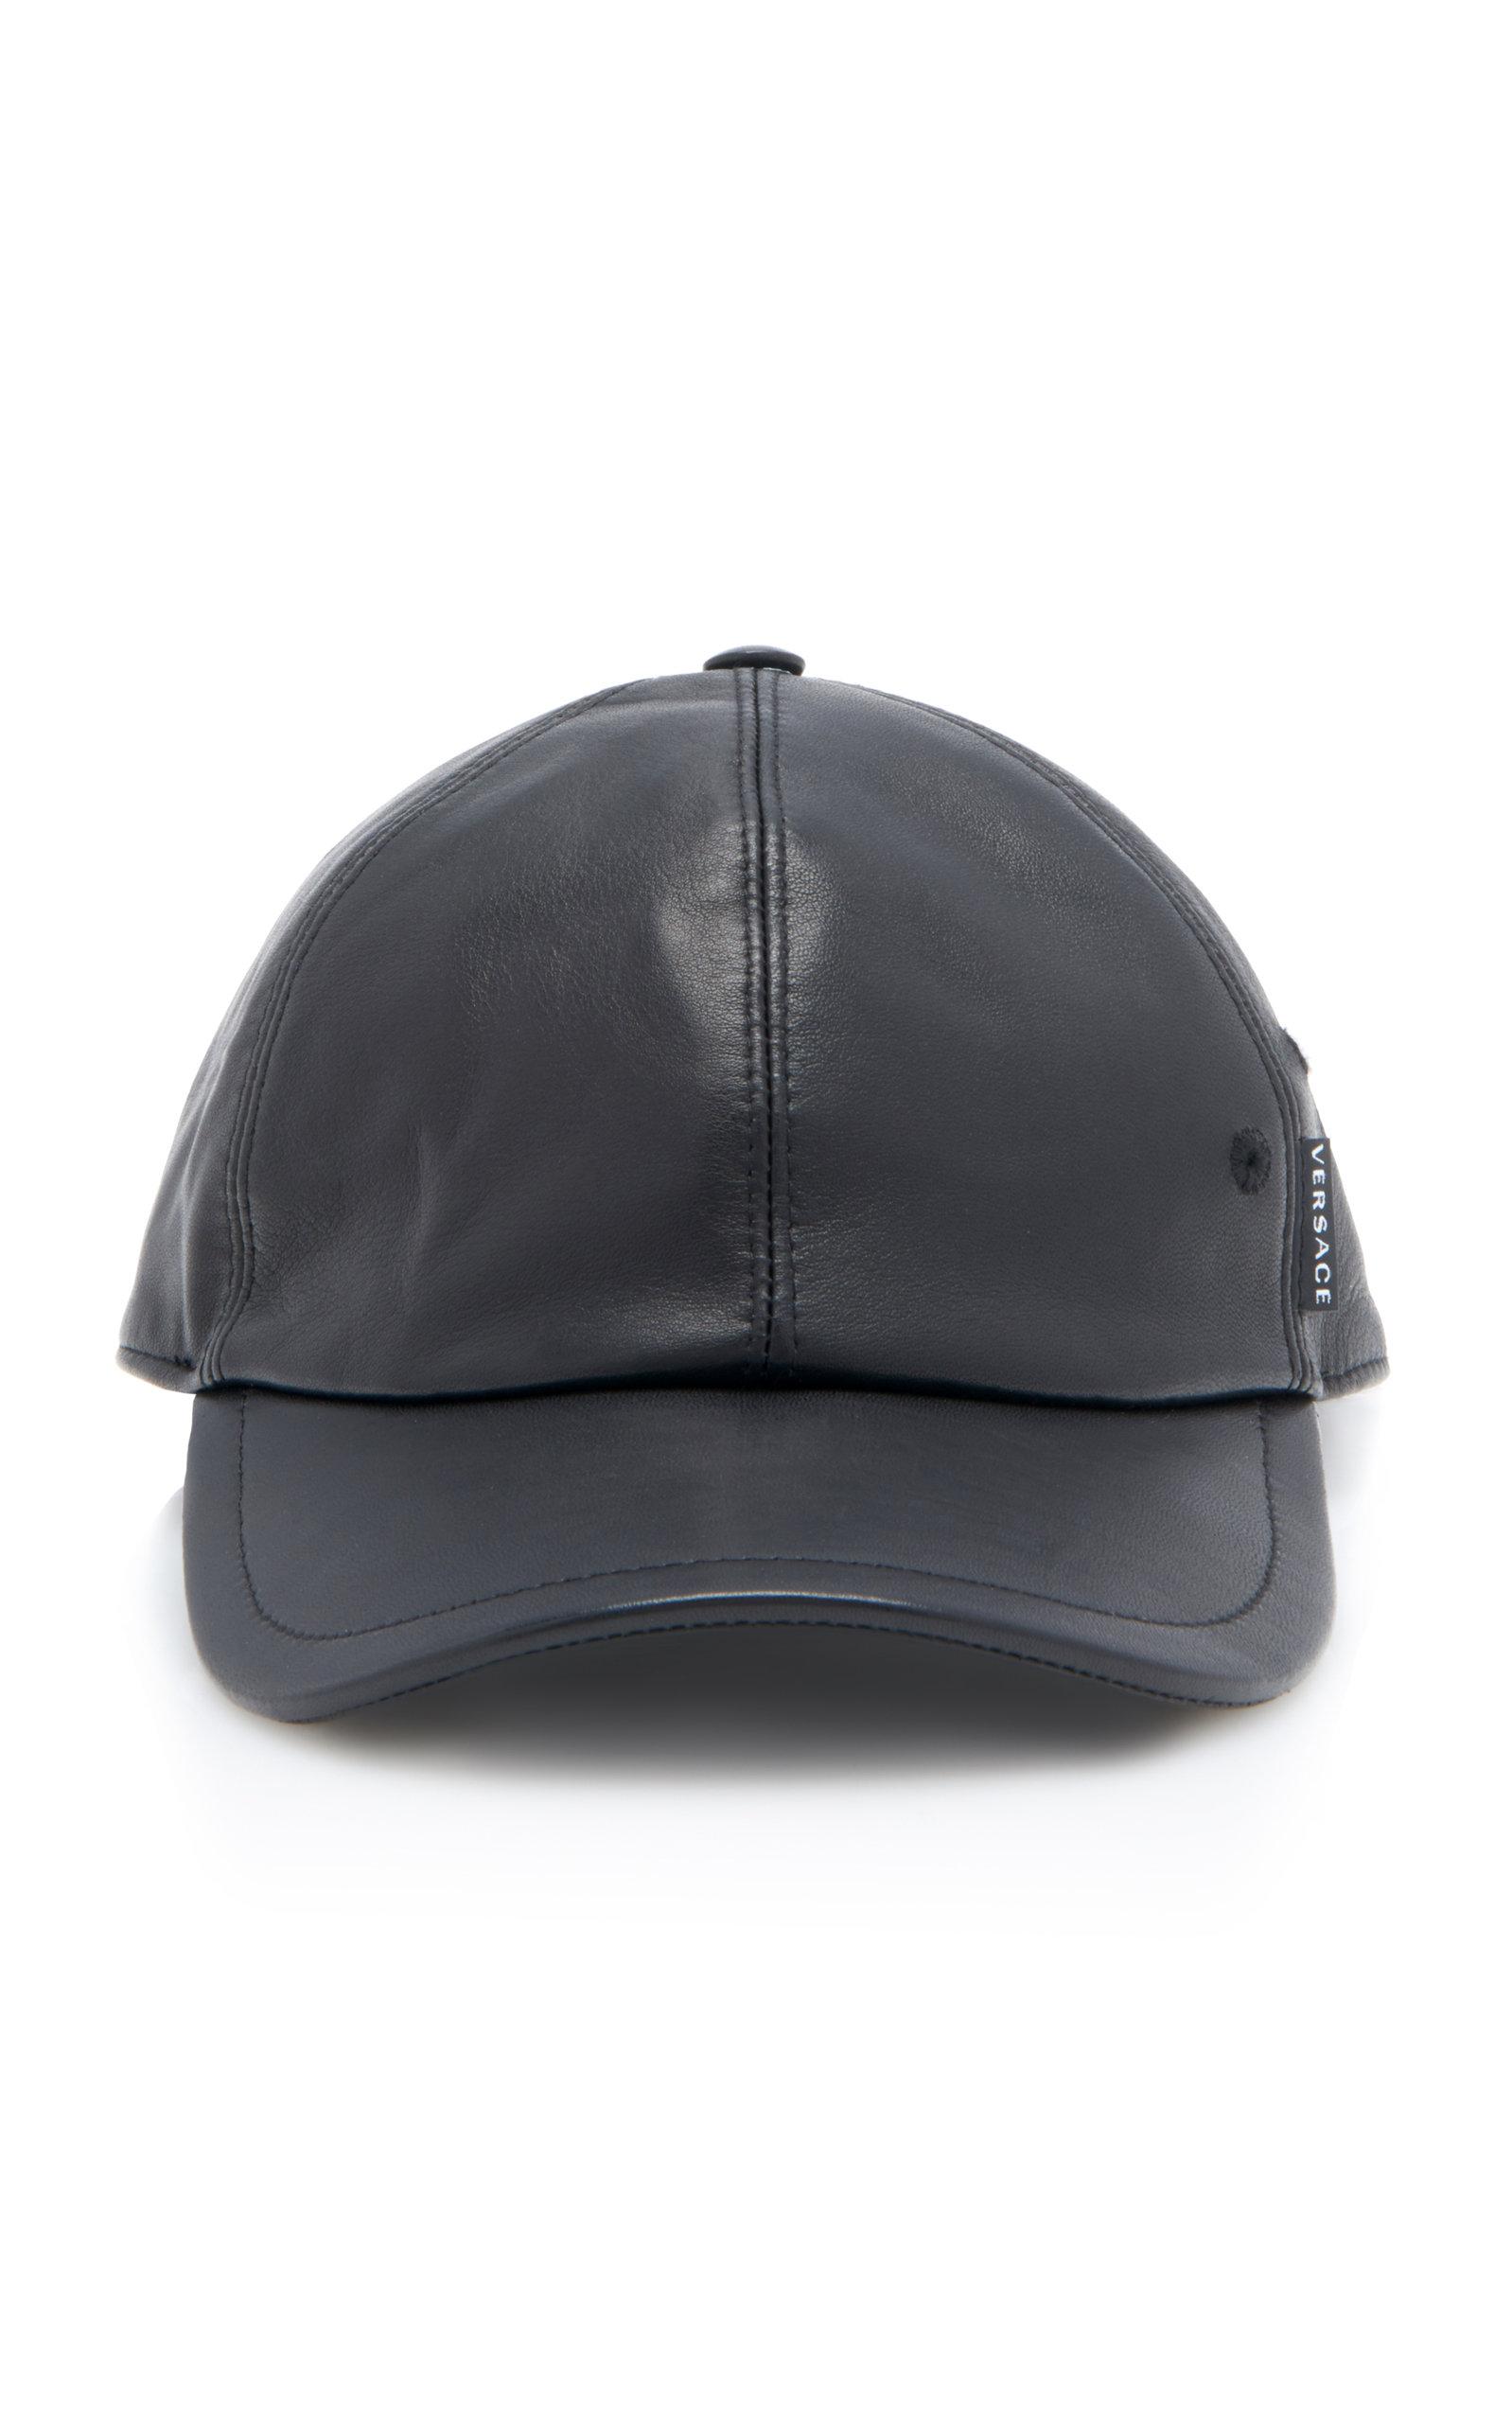 Leather Cap by Versace  bdf573189db